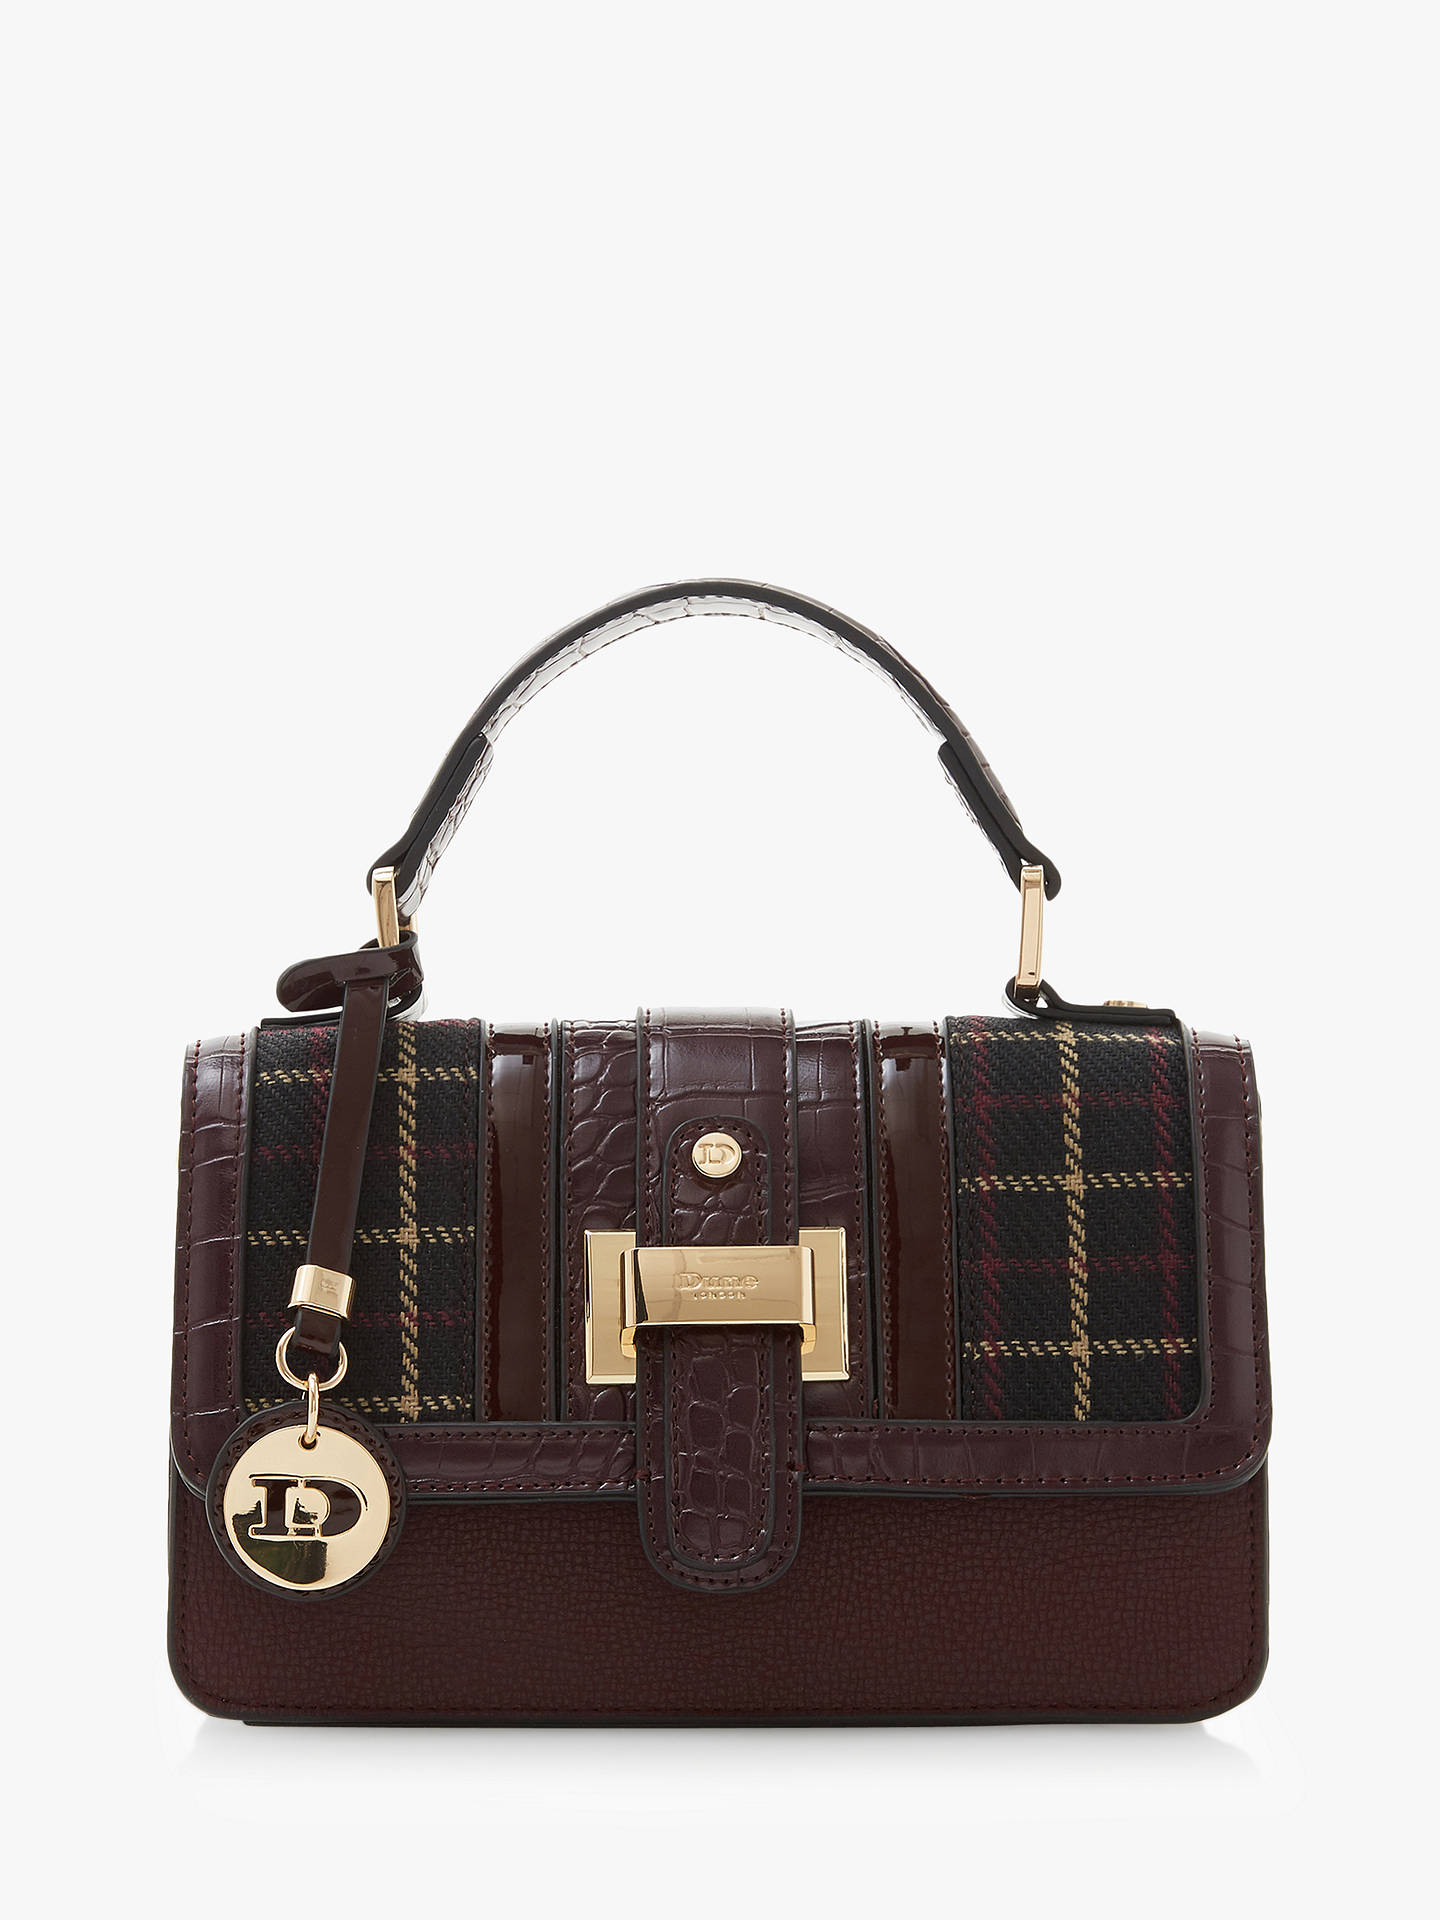 dune dprince fabric satchel bag black burgundy at john lewis partners rh johnlewis com